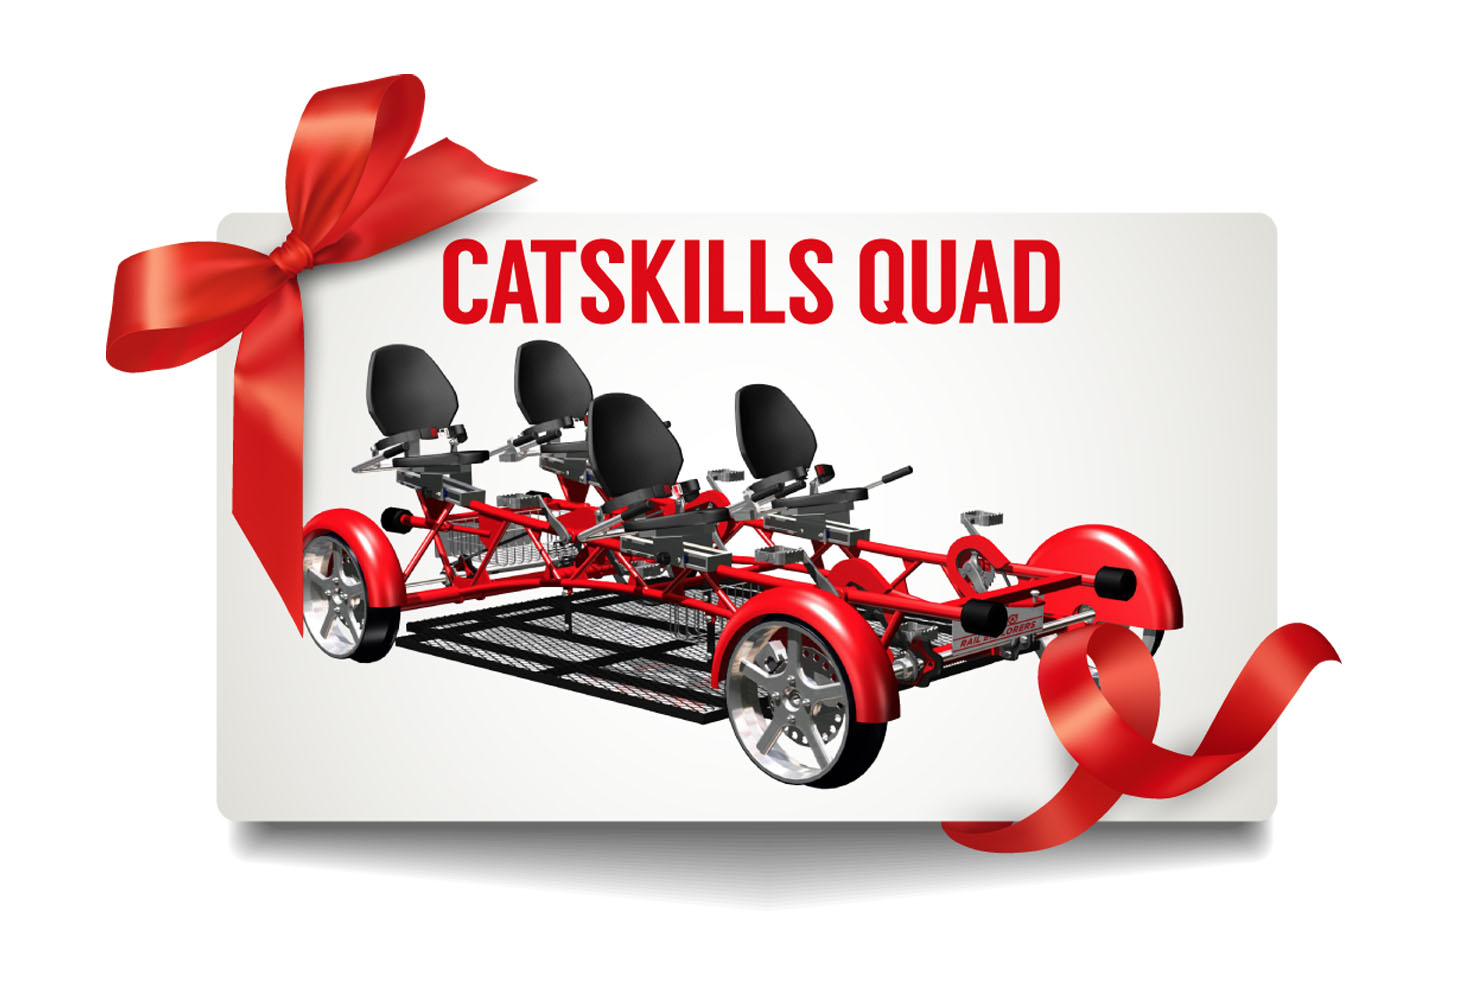 Gift Card: Catskills Quad $150